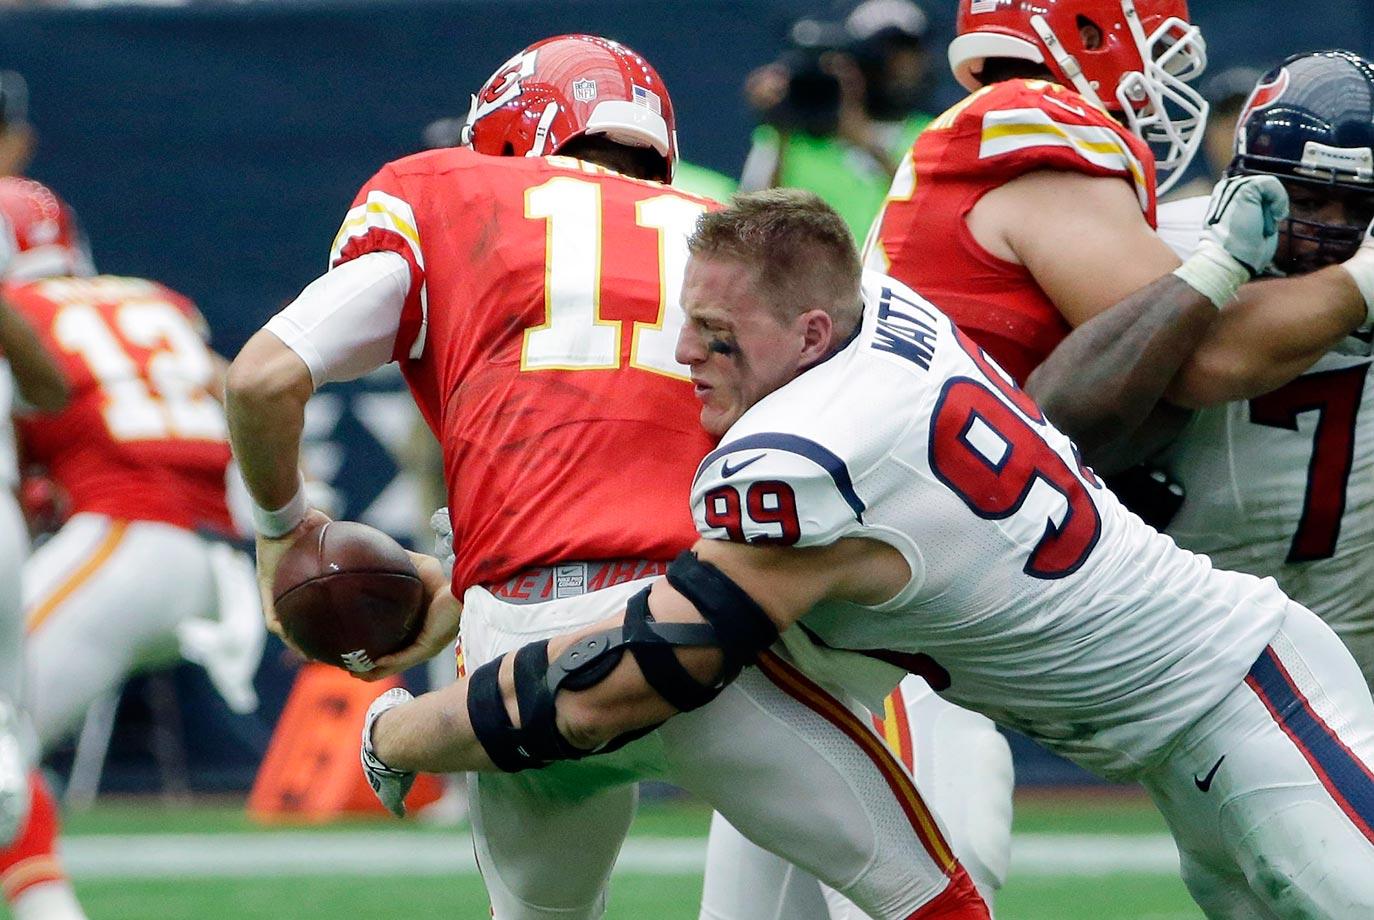 J.J. Watt of the Houston Texans sacks Alex Smith of the Kansas City Chiefs.